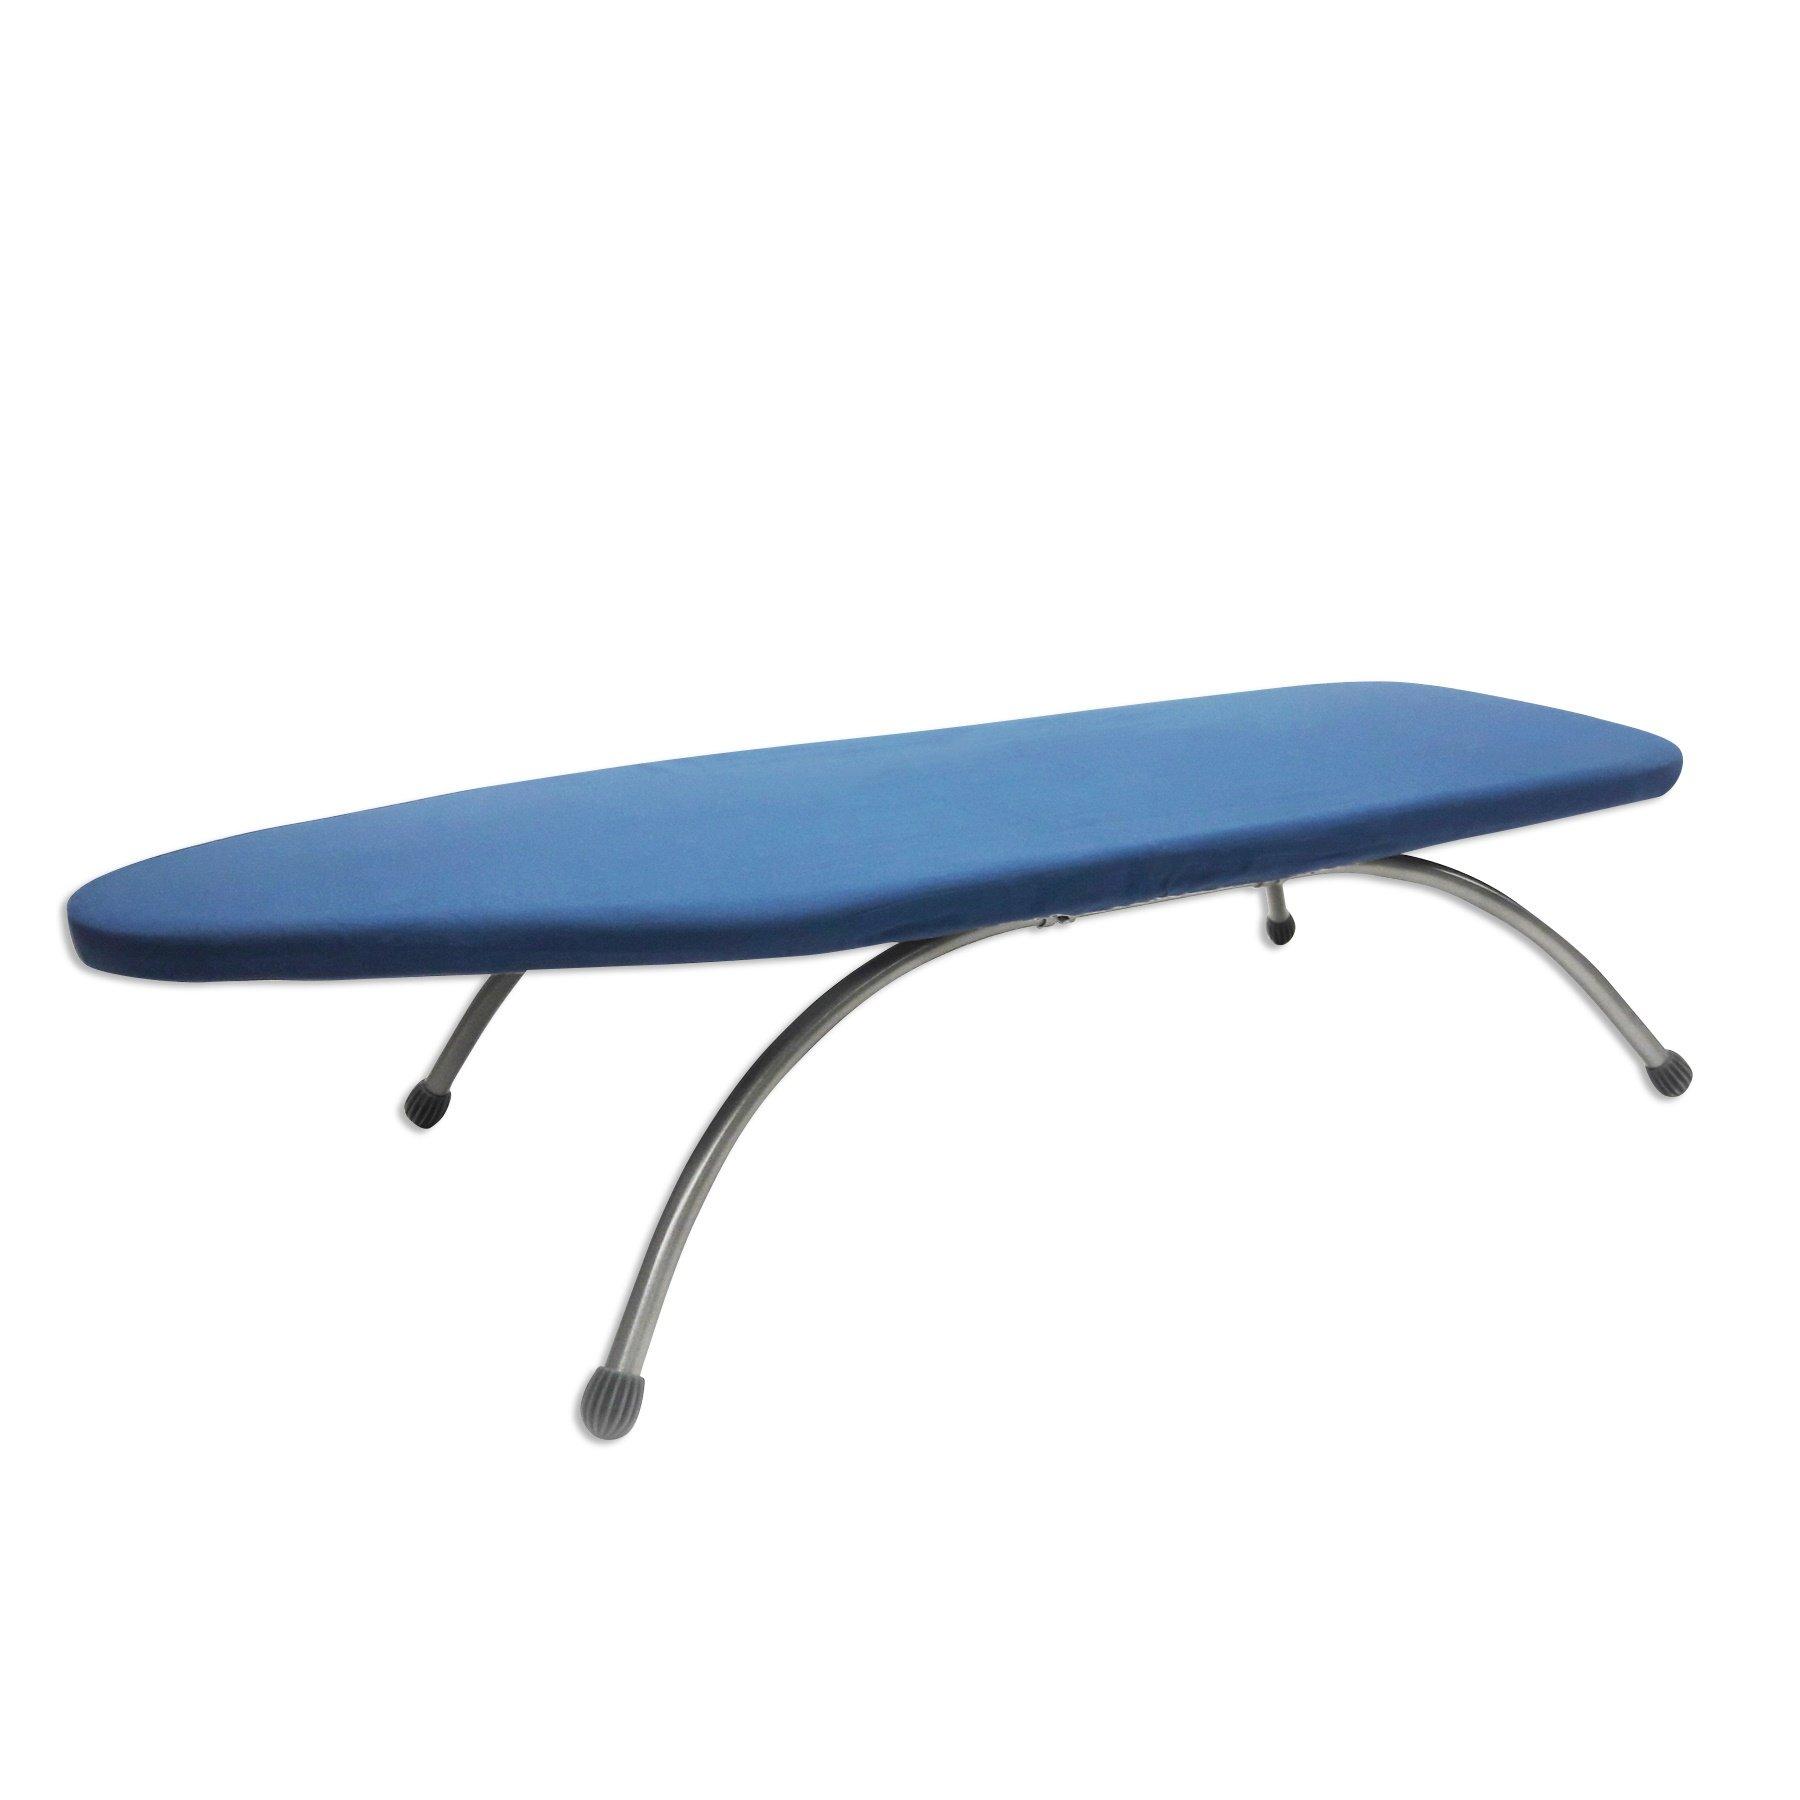 HOMZ Premium Steel Large Countertop Ironing Board, Anywhere Ironing Board, Blue